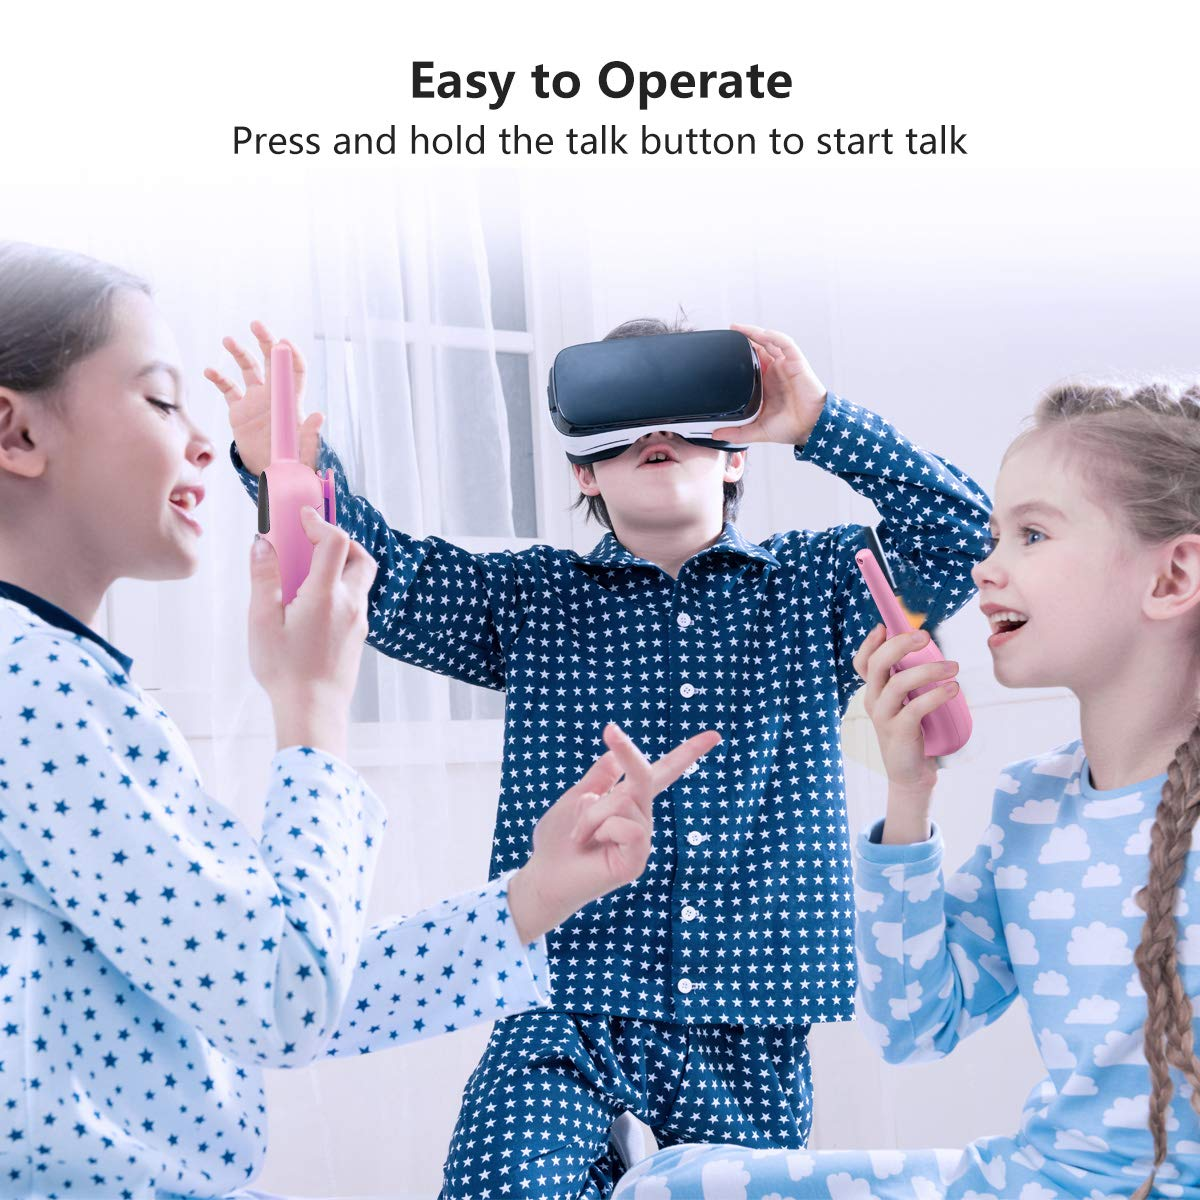 Blue MAX 5000M Open Field floureon Kids Walkie Talkies Two Way Radios 22 Channel 3000M UHF Long Range Handheld Talkies Talky 8D35I6EM